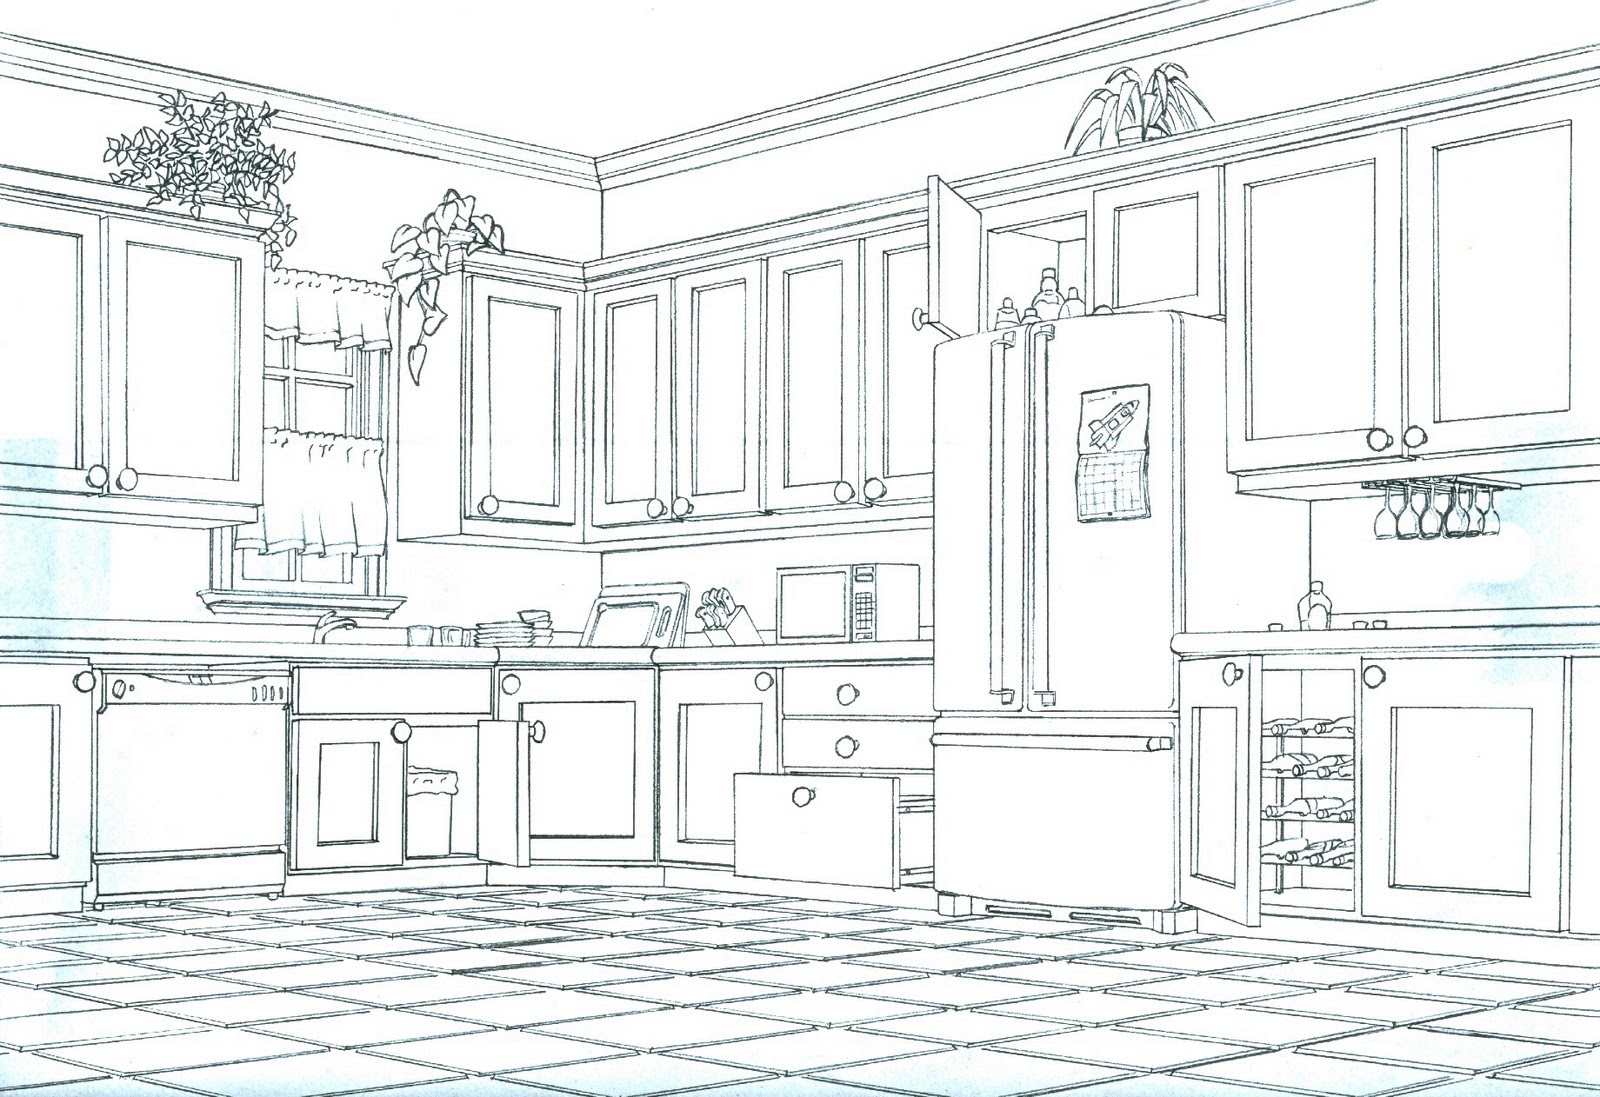 Octachoron Digital Blog: Two-Point Perspective Kitchen